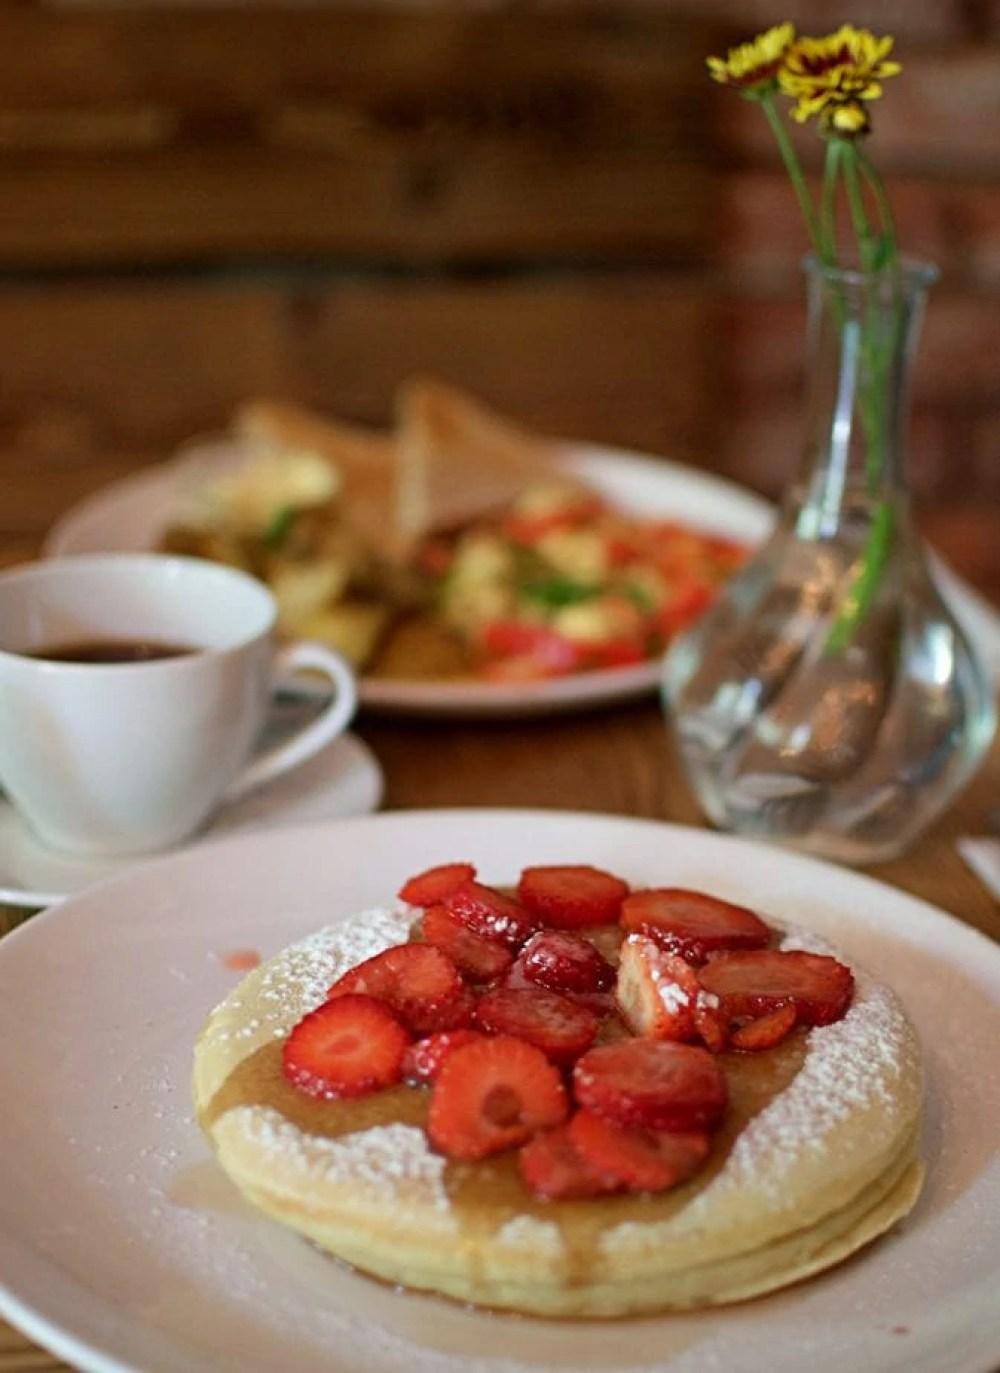 vegan breakfast in Prague at Satsang